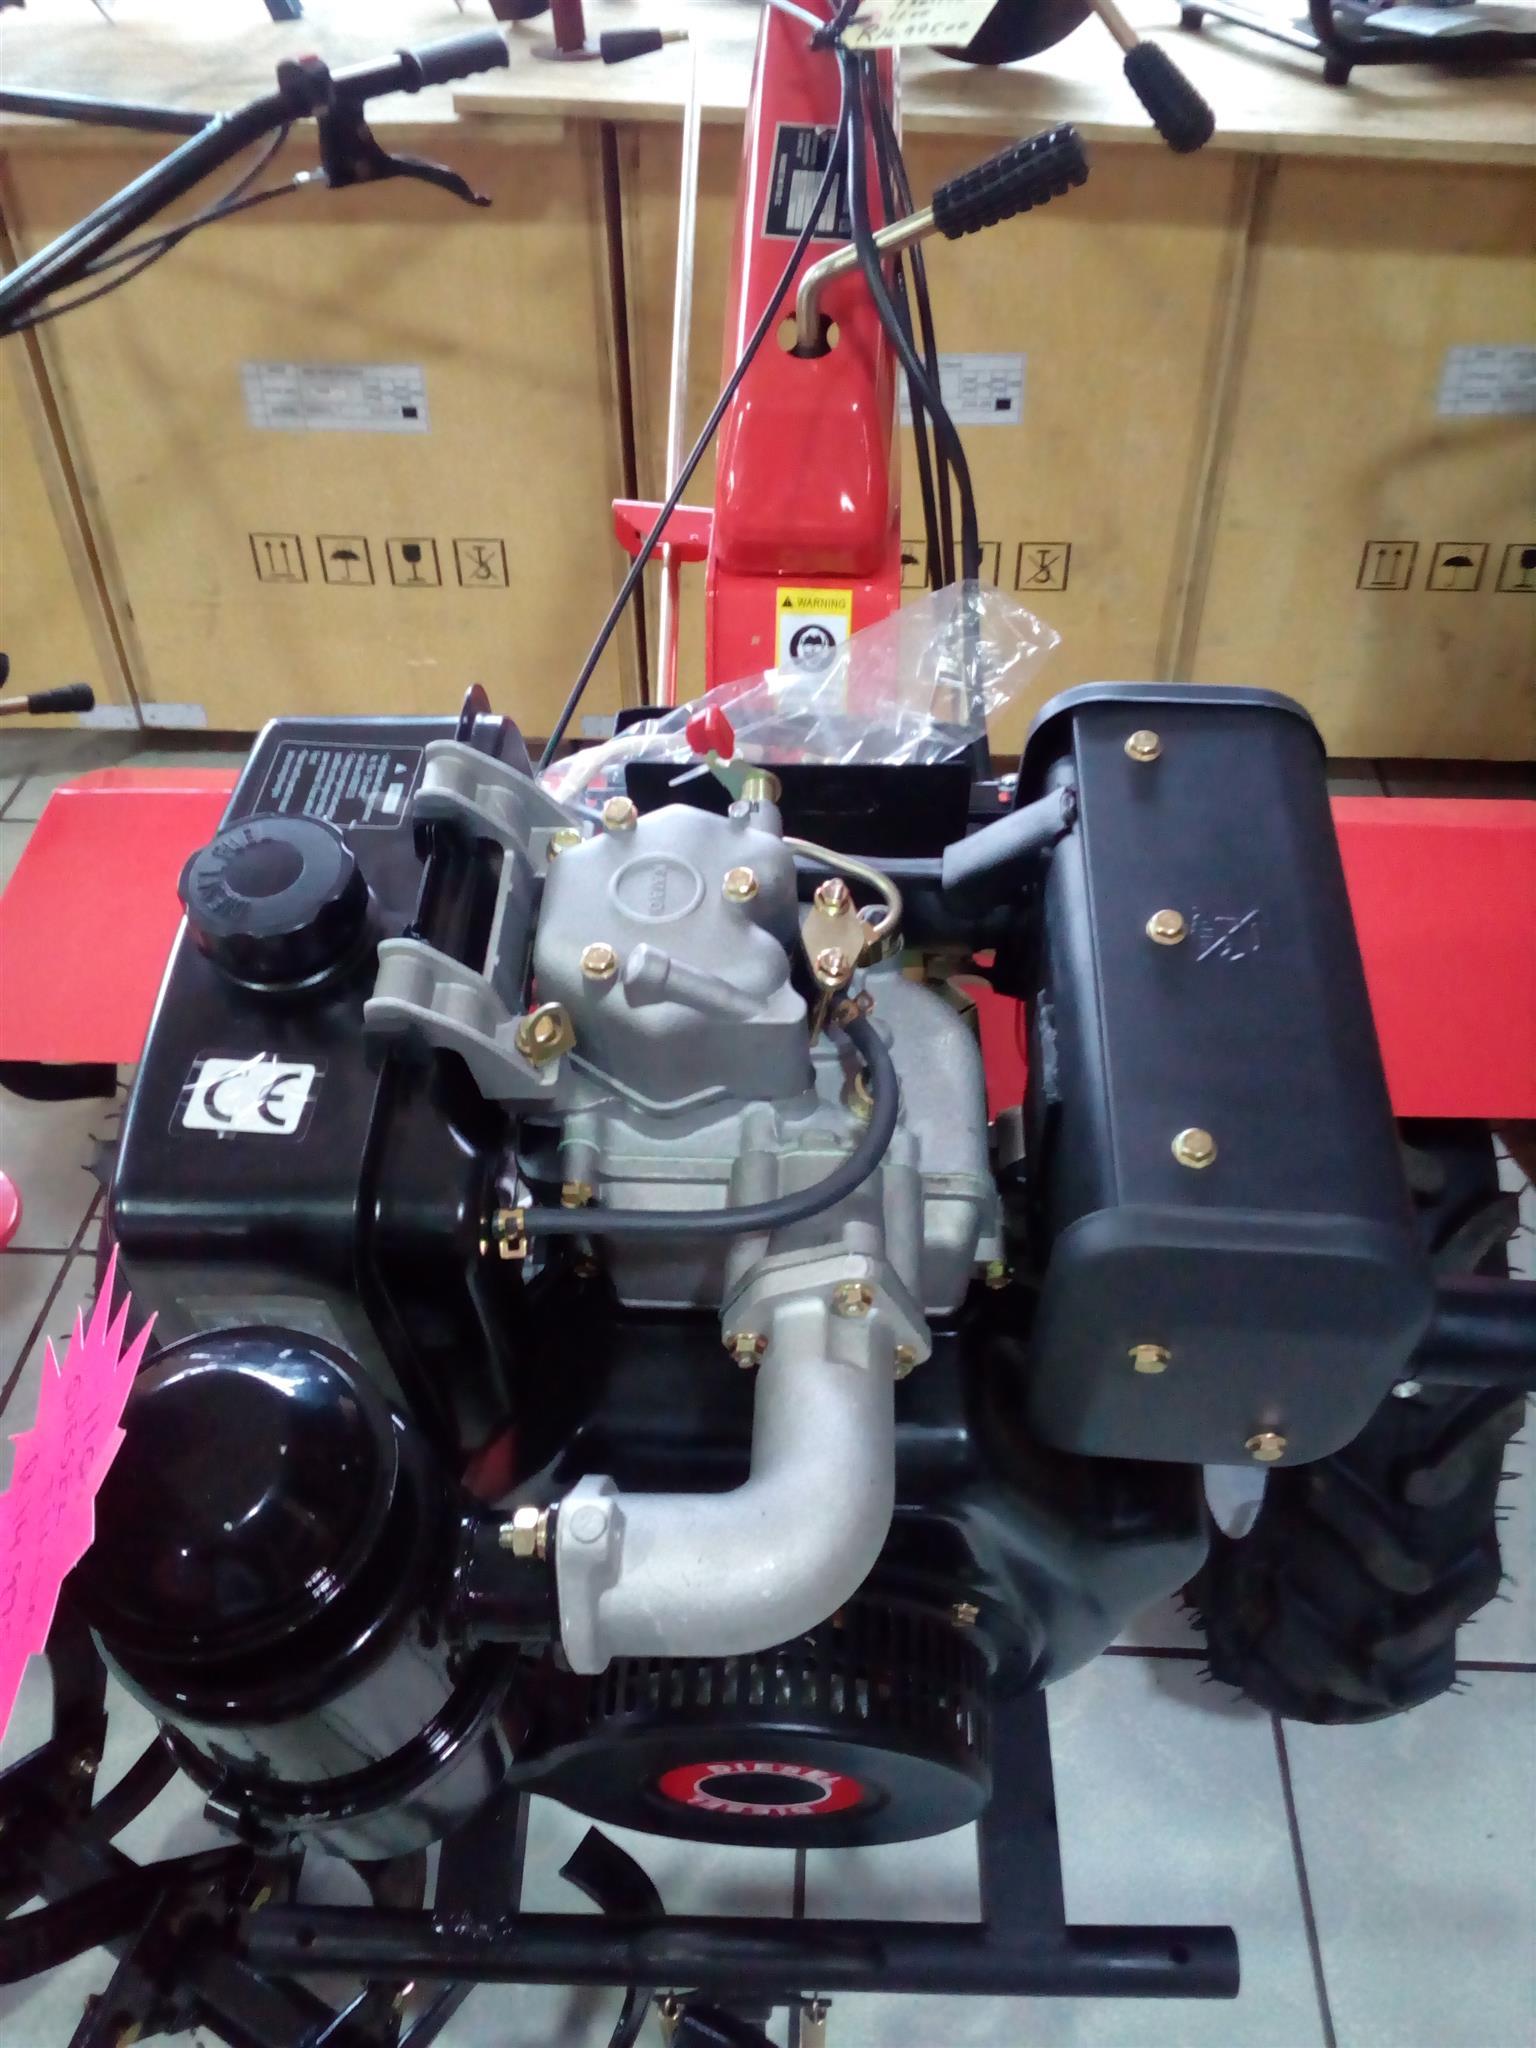 Magnum 1100B/9hp Diesel cultivator Price included Vat